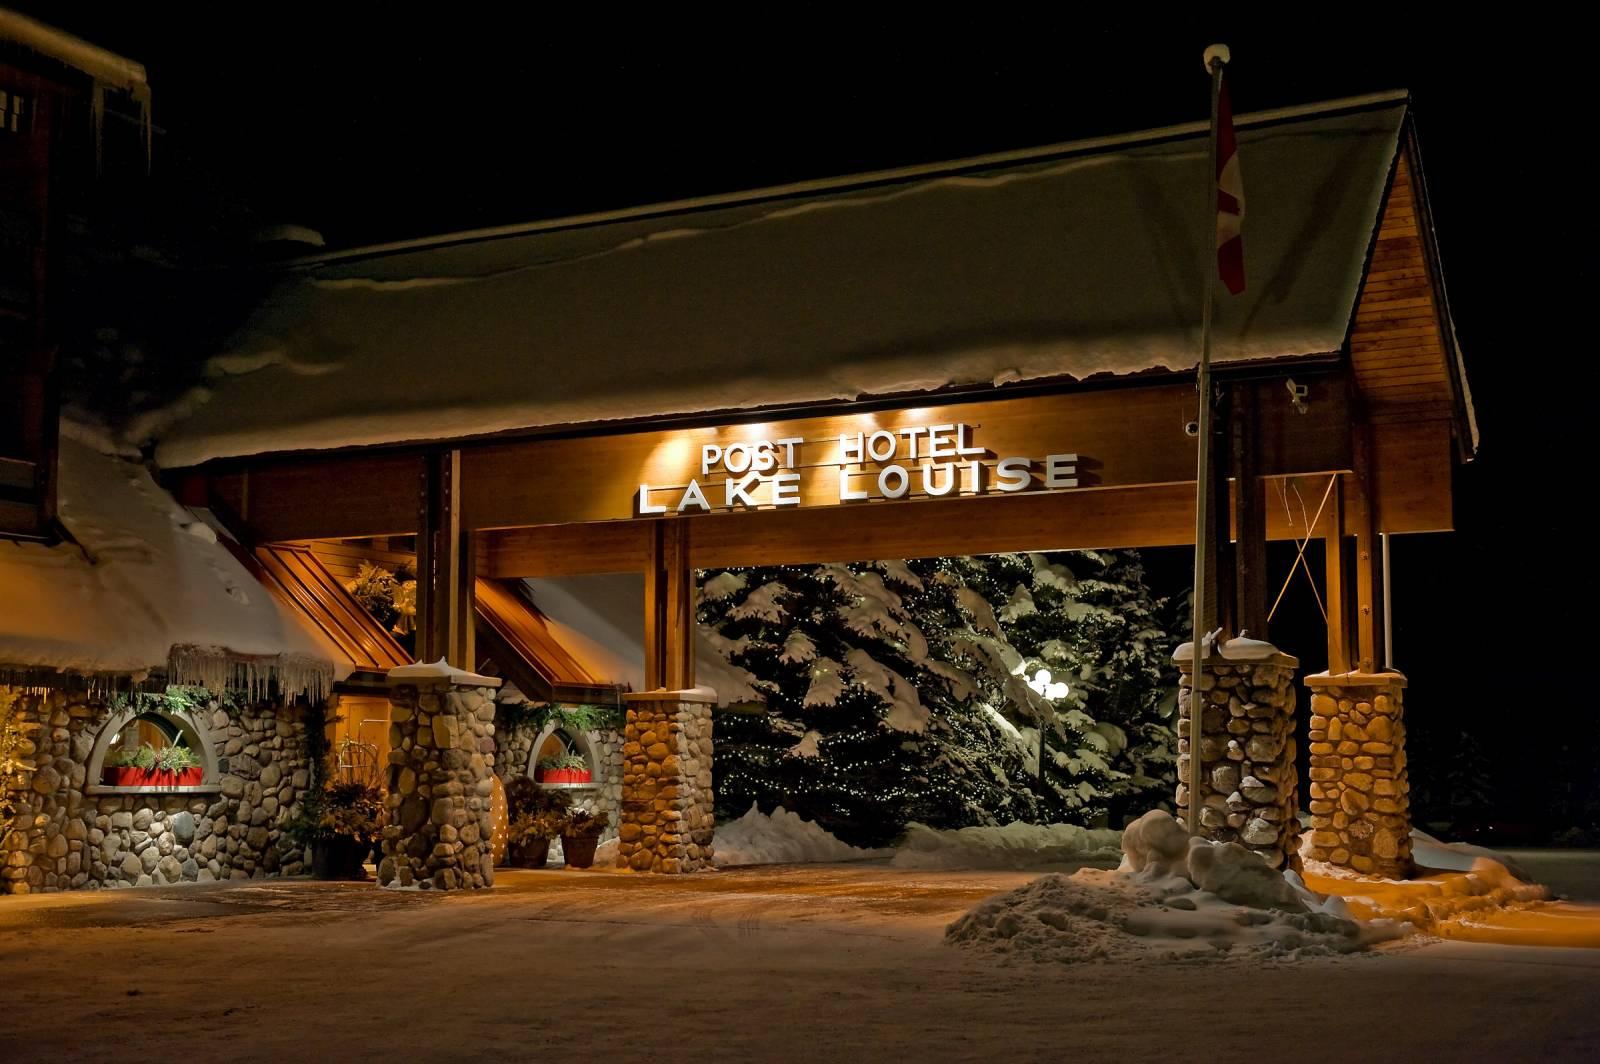 The Post Hotel Lake Louise Wedding Venue Alberta Wedding Item 38